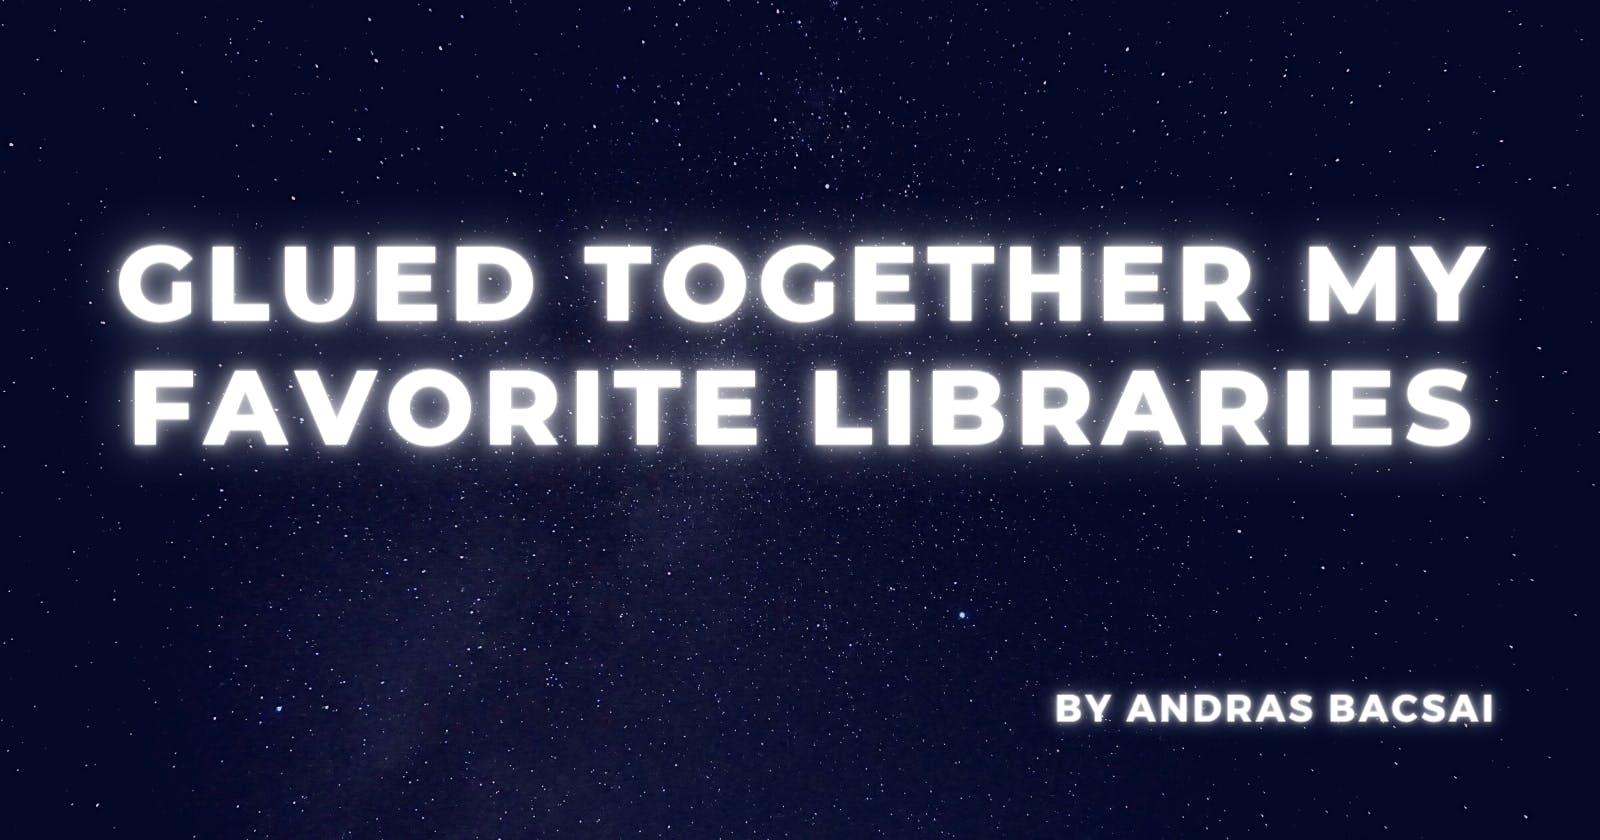 Glued together my favorite libraries